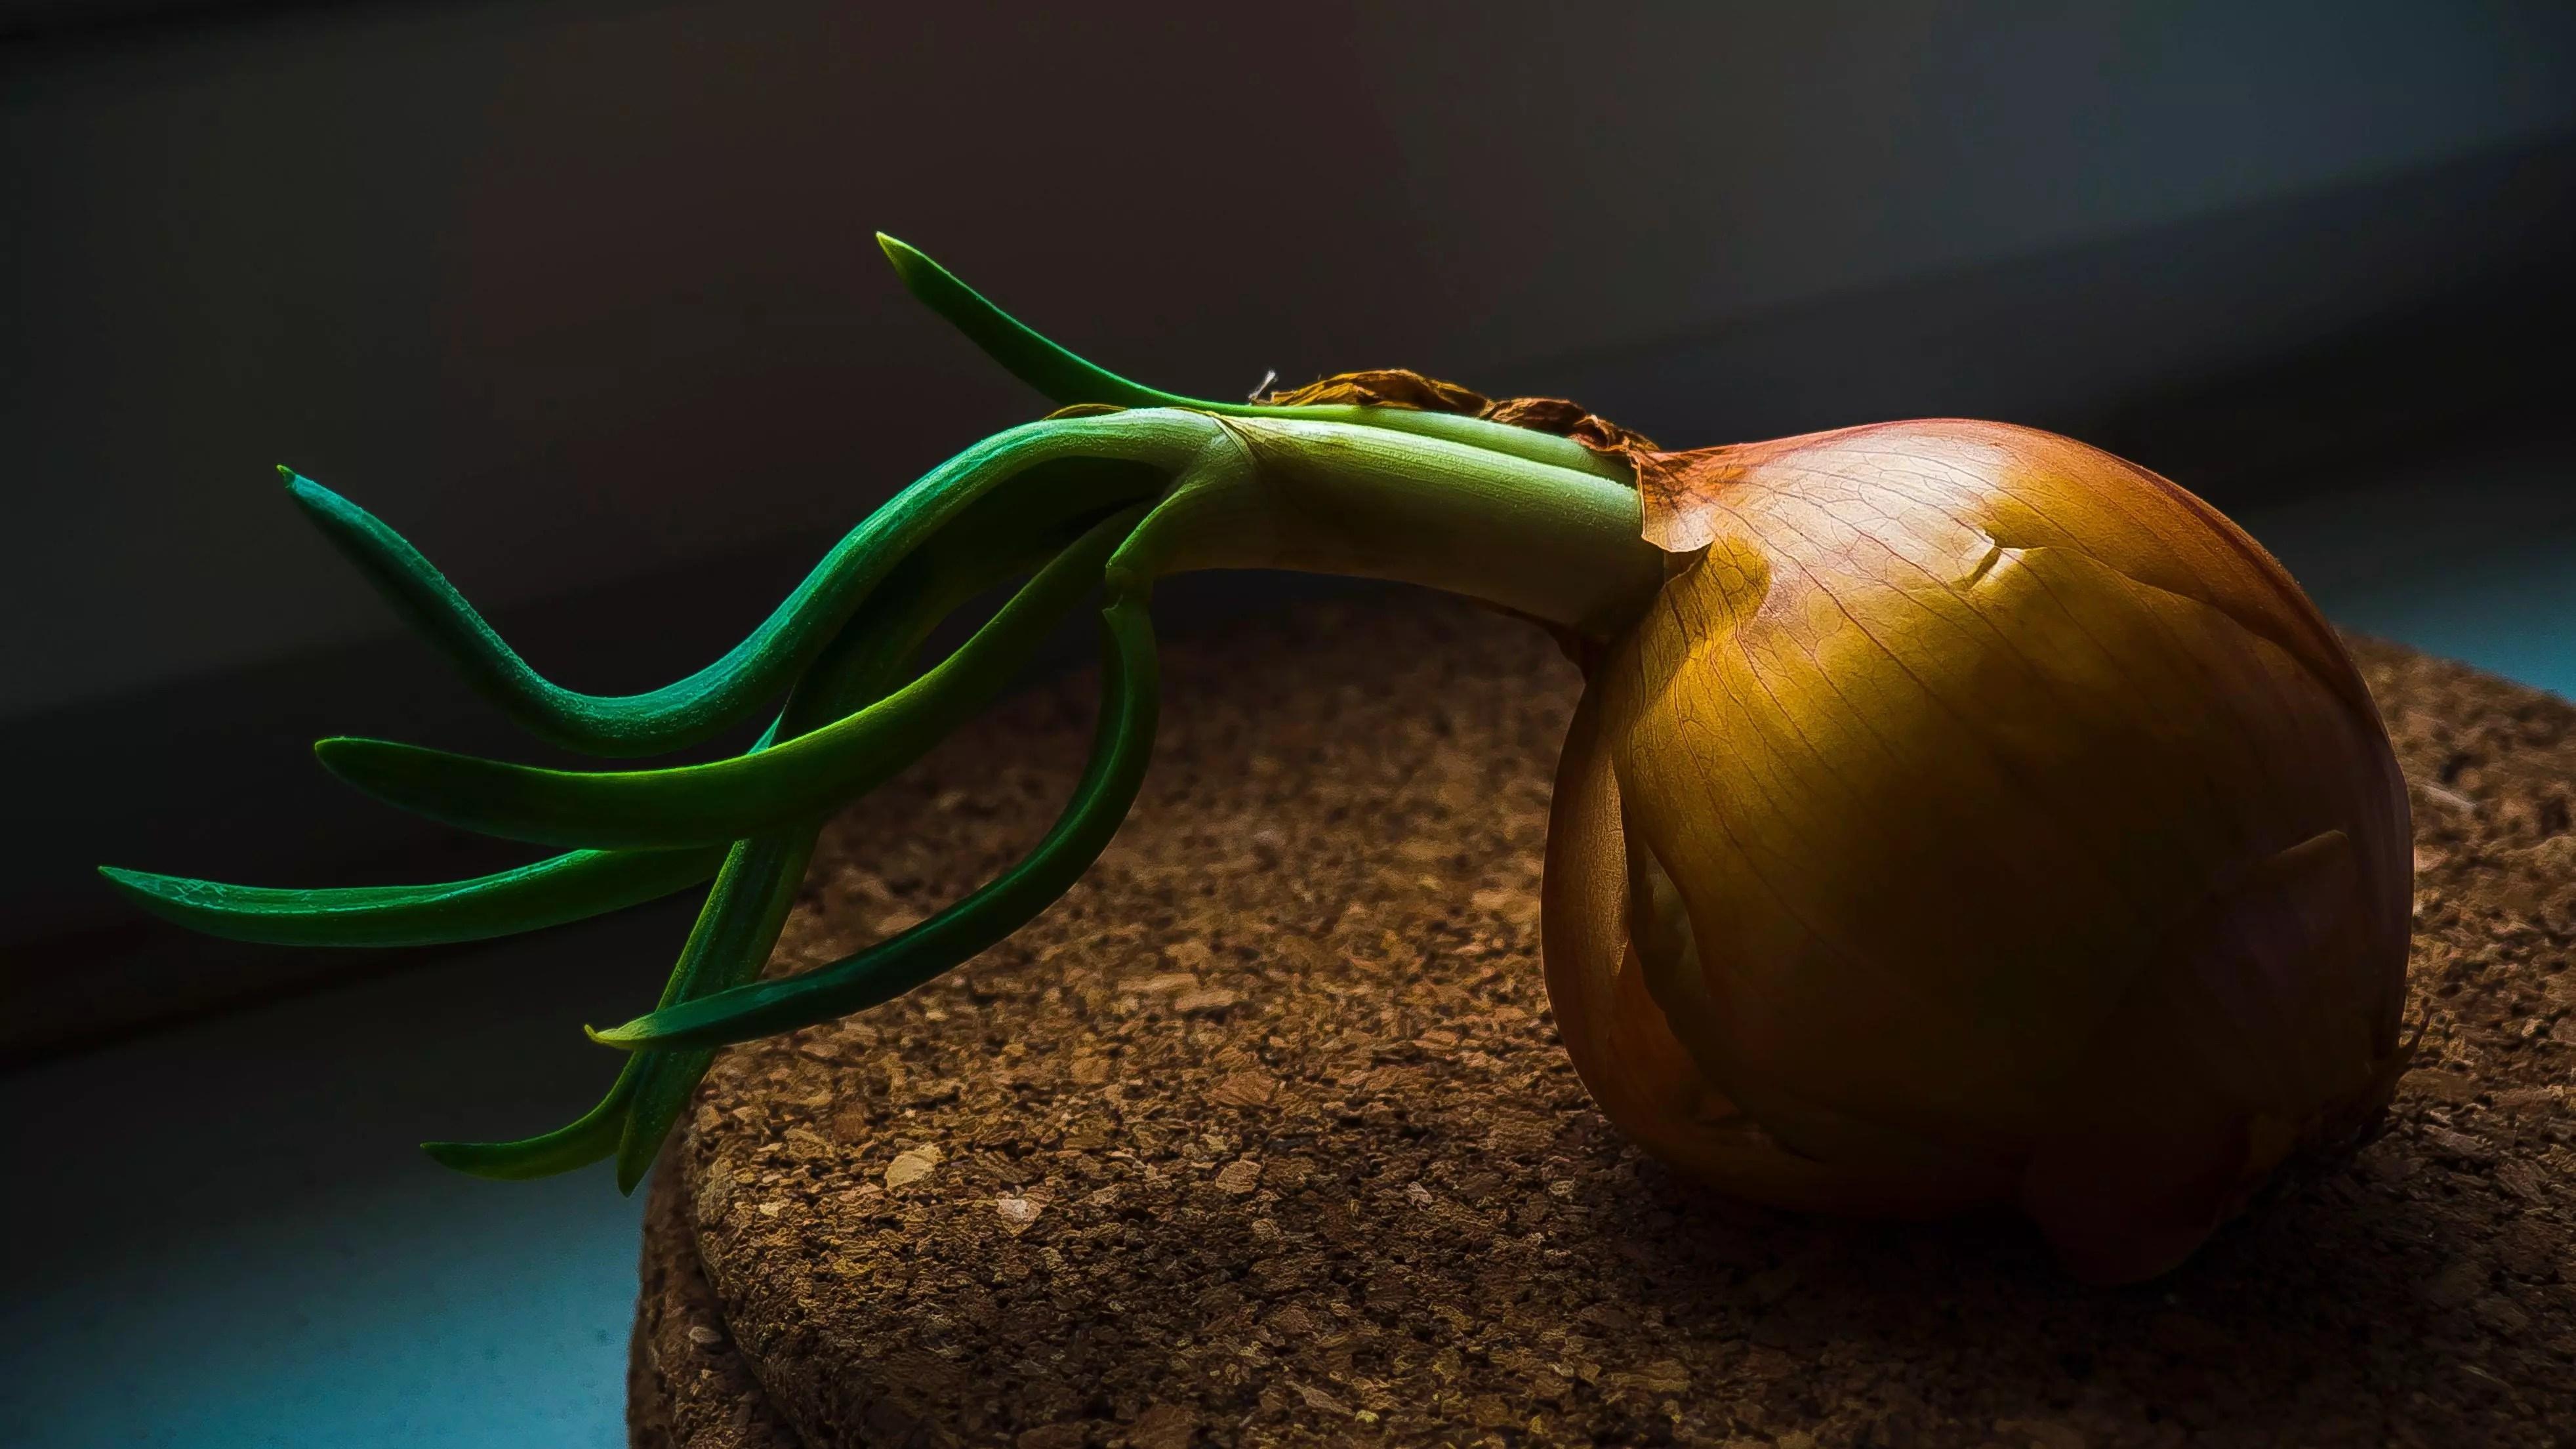 onion bulb